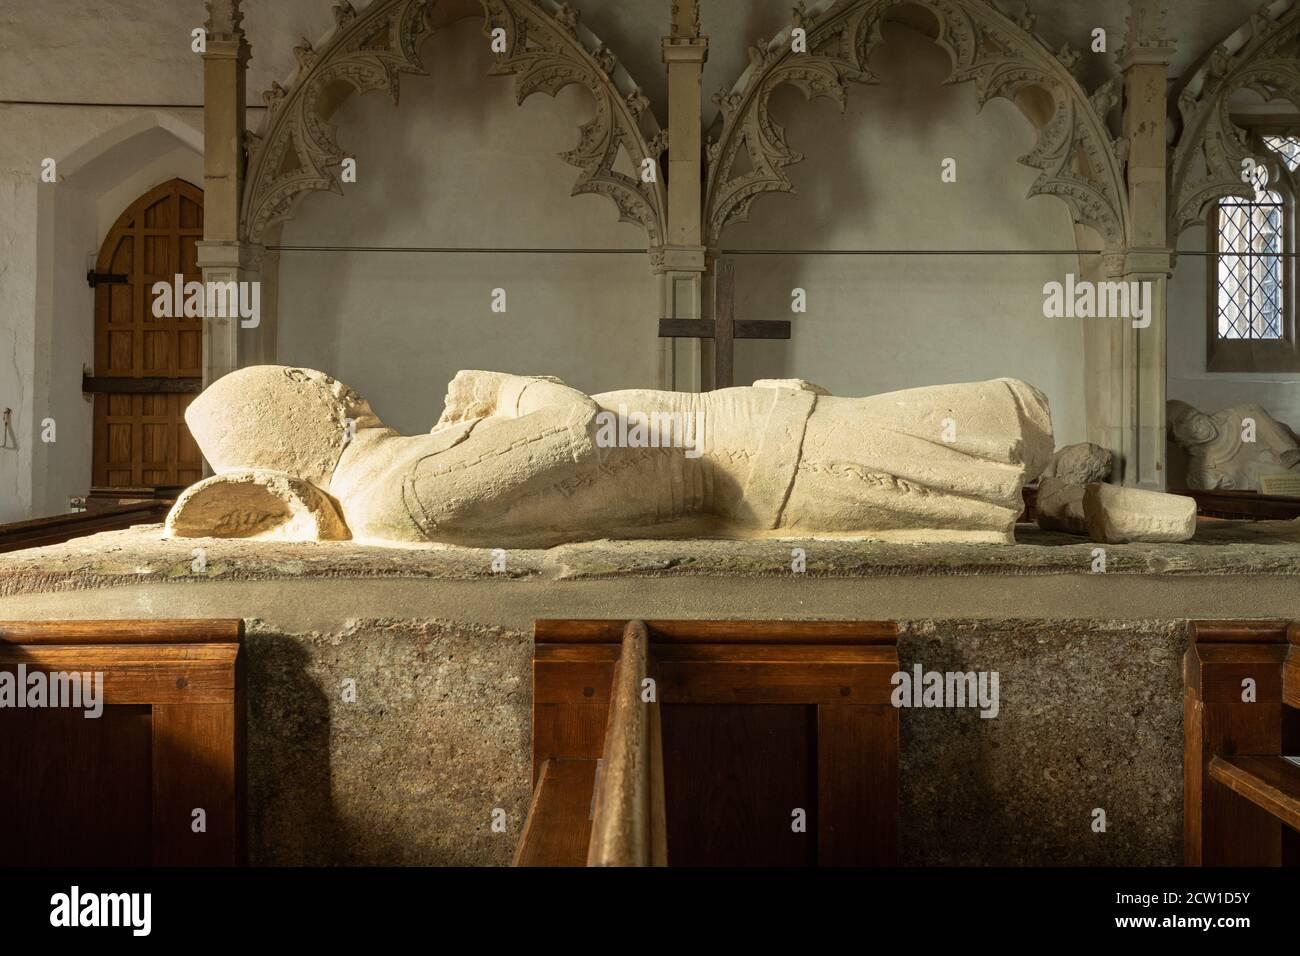 14th century De la Beche family effigies known as the Aldworth Giants inside St Mary's Church in Aldworth village, Berkshire, UK Stock Photo